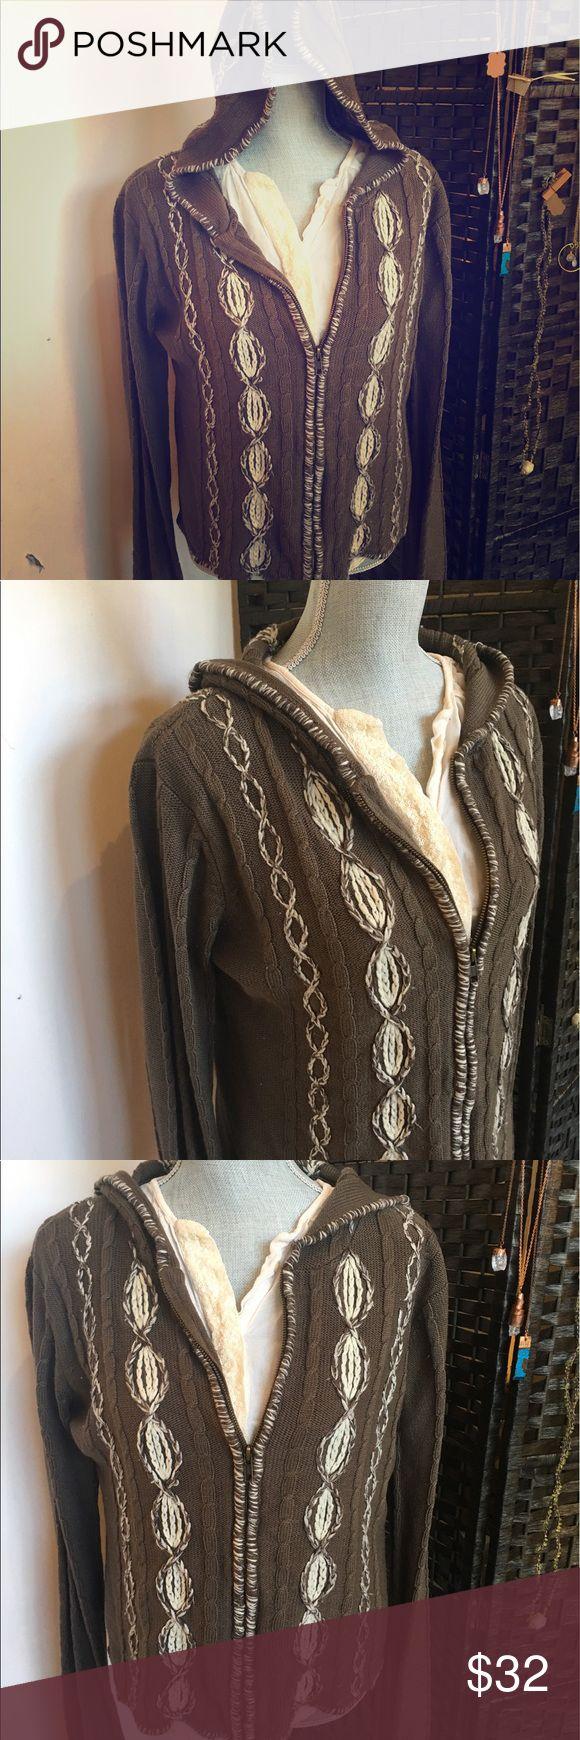 Sweater hand woven Cream and brown handwoven zip up hoodie velvet ivy Sweaters Cardigans